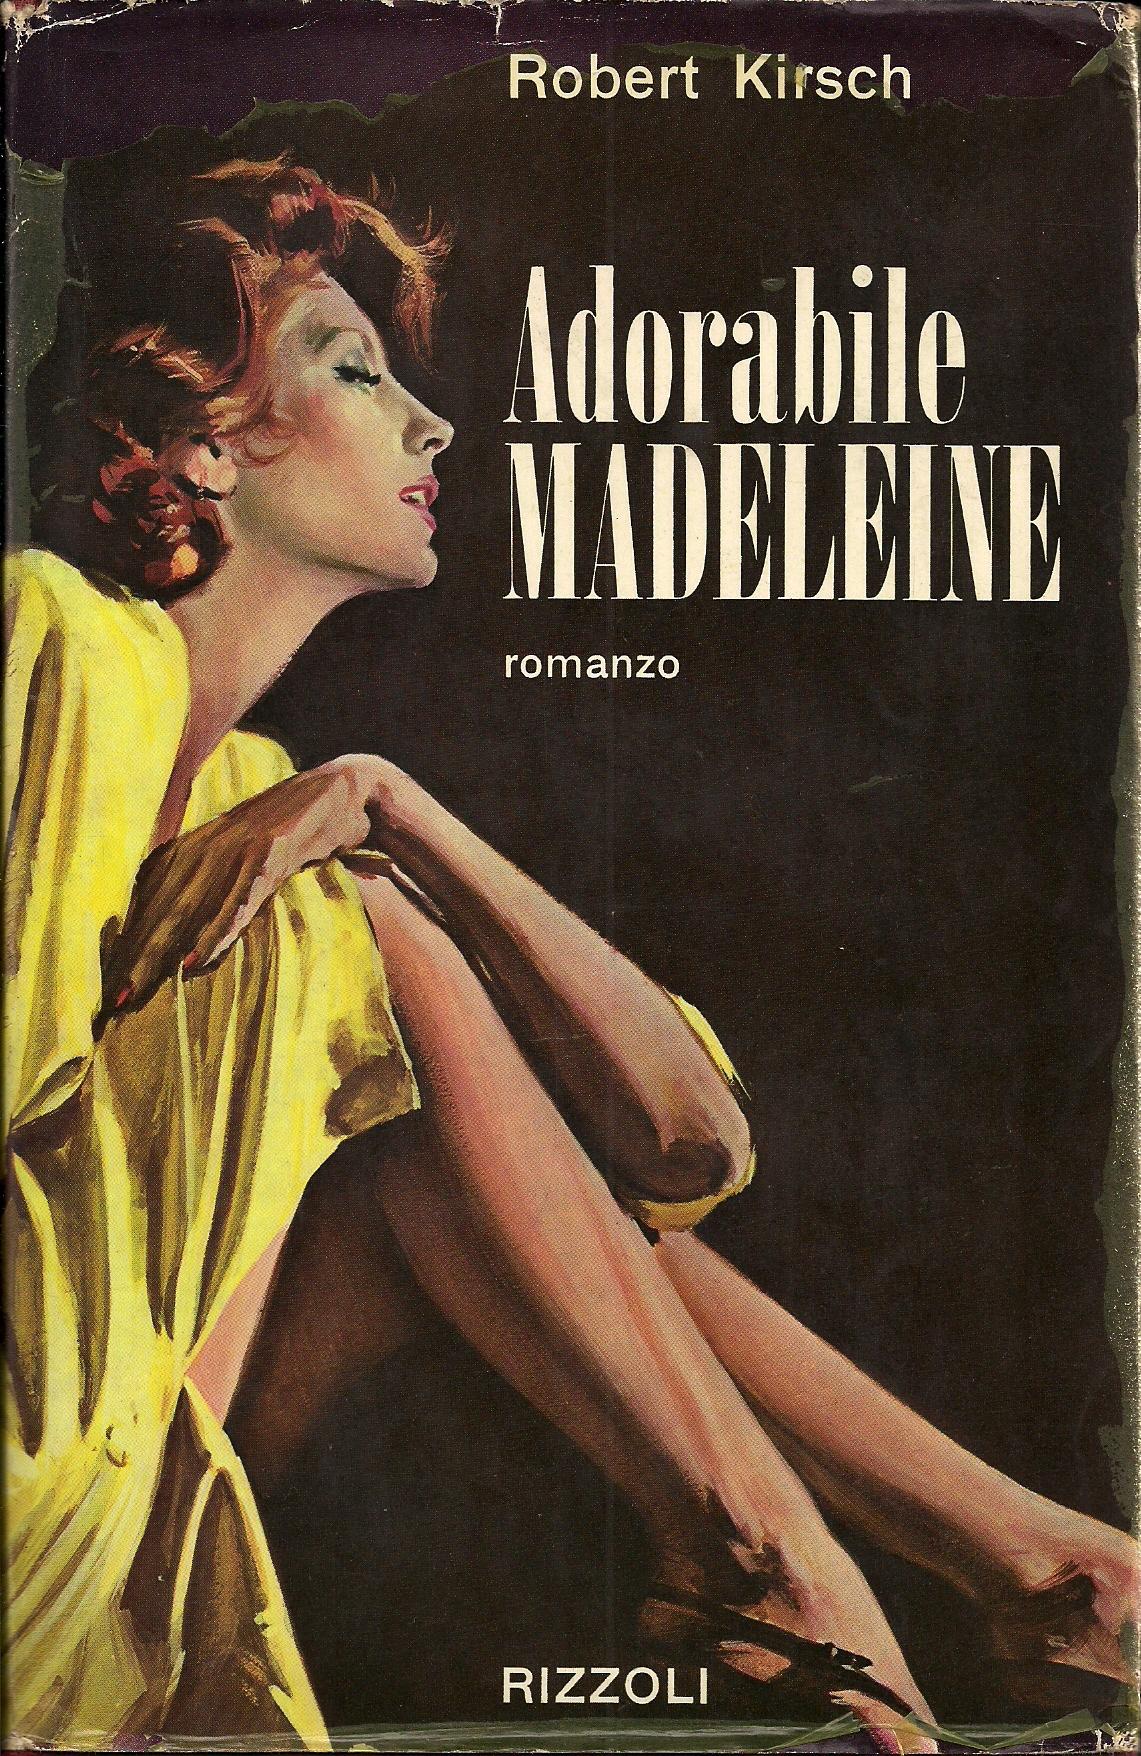 Adorabile Madeleine